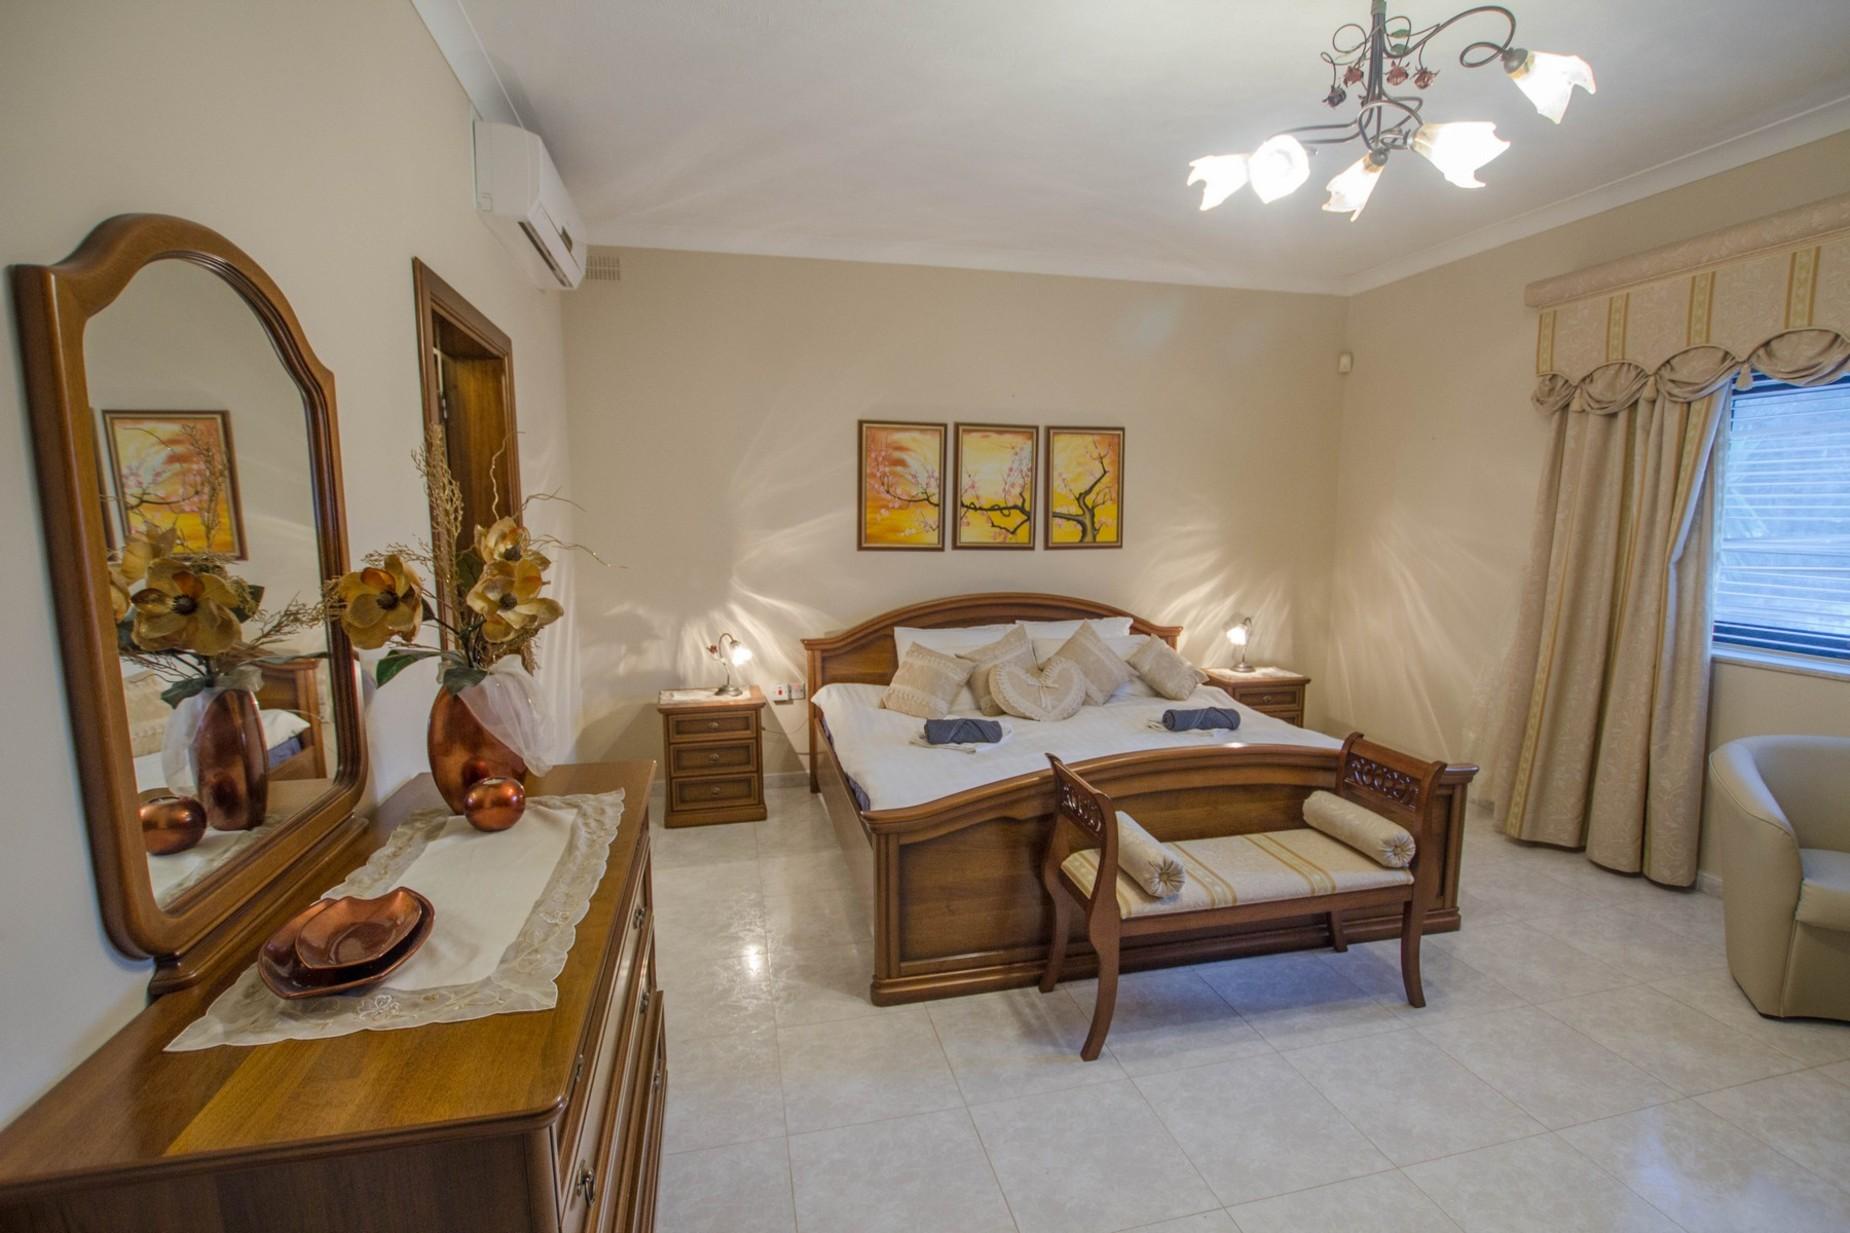 6 bed Villa For Rent in Mellieha, Mellieha - thumb 8